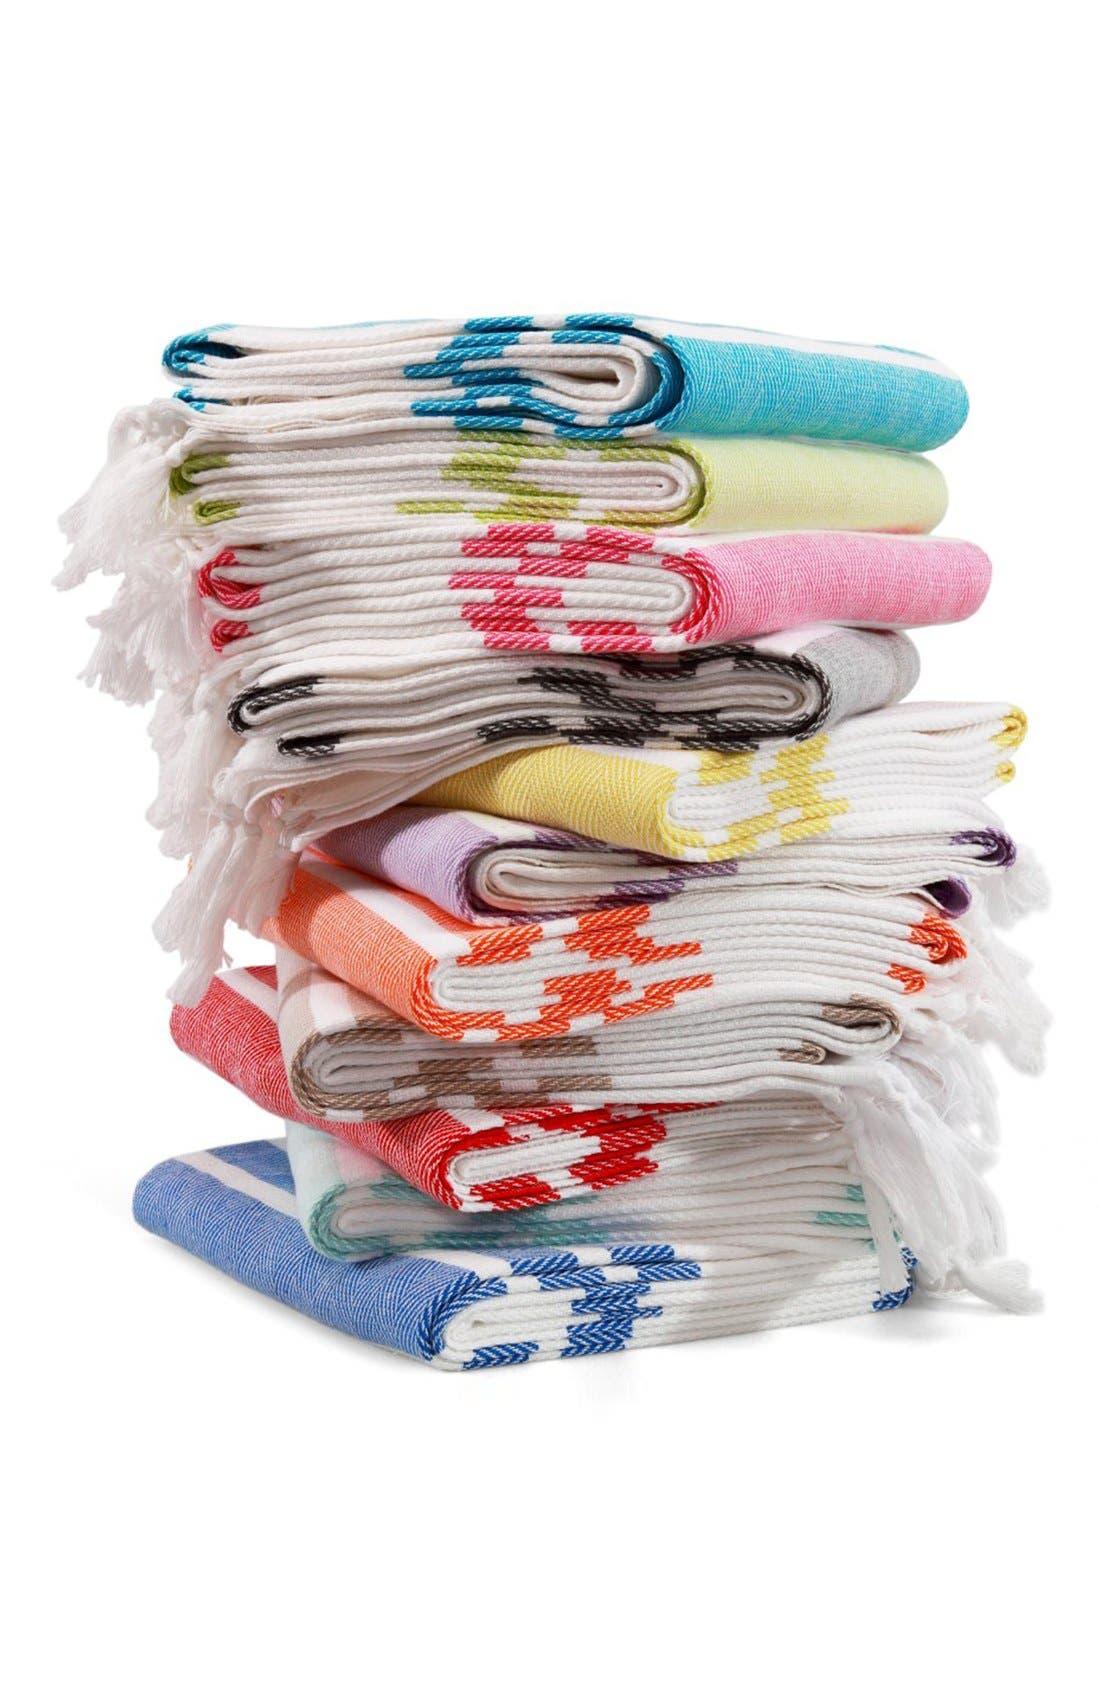 Herringbone Striped Turkish Pestemal Towel,                             Alternate thumbnail 5, color,